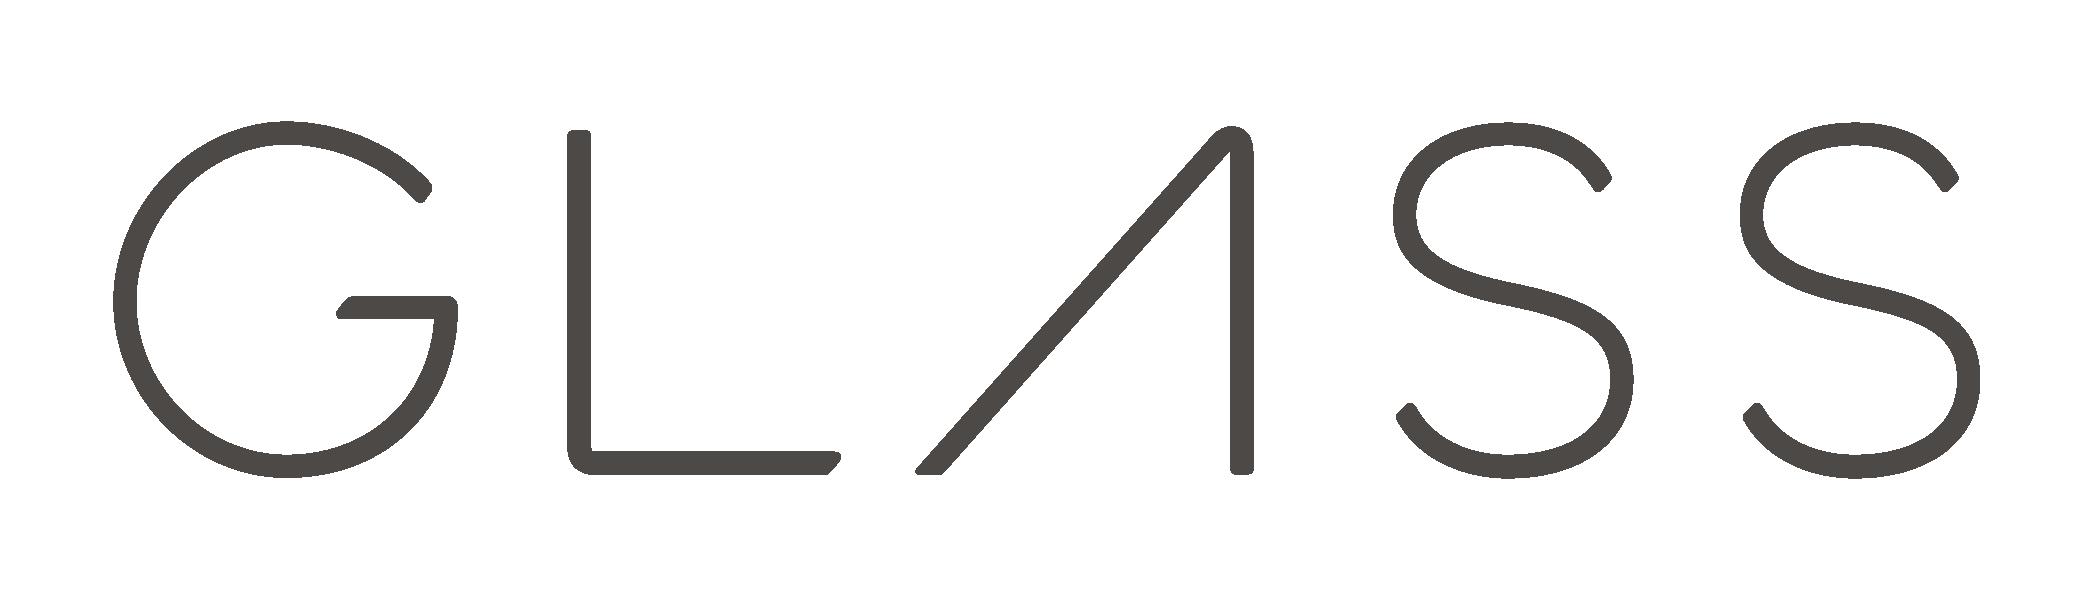 glass-logo-charcoal-1-2-.png